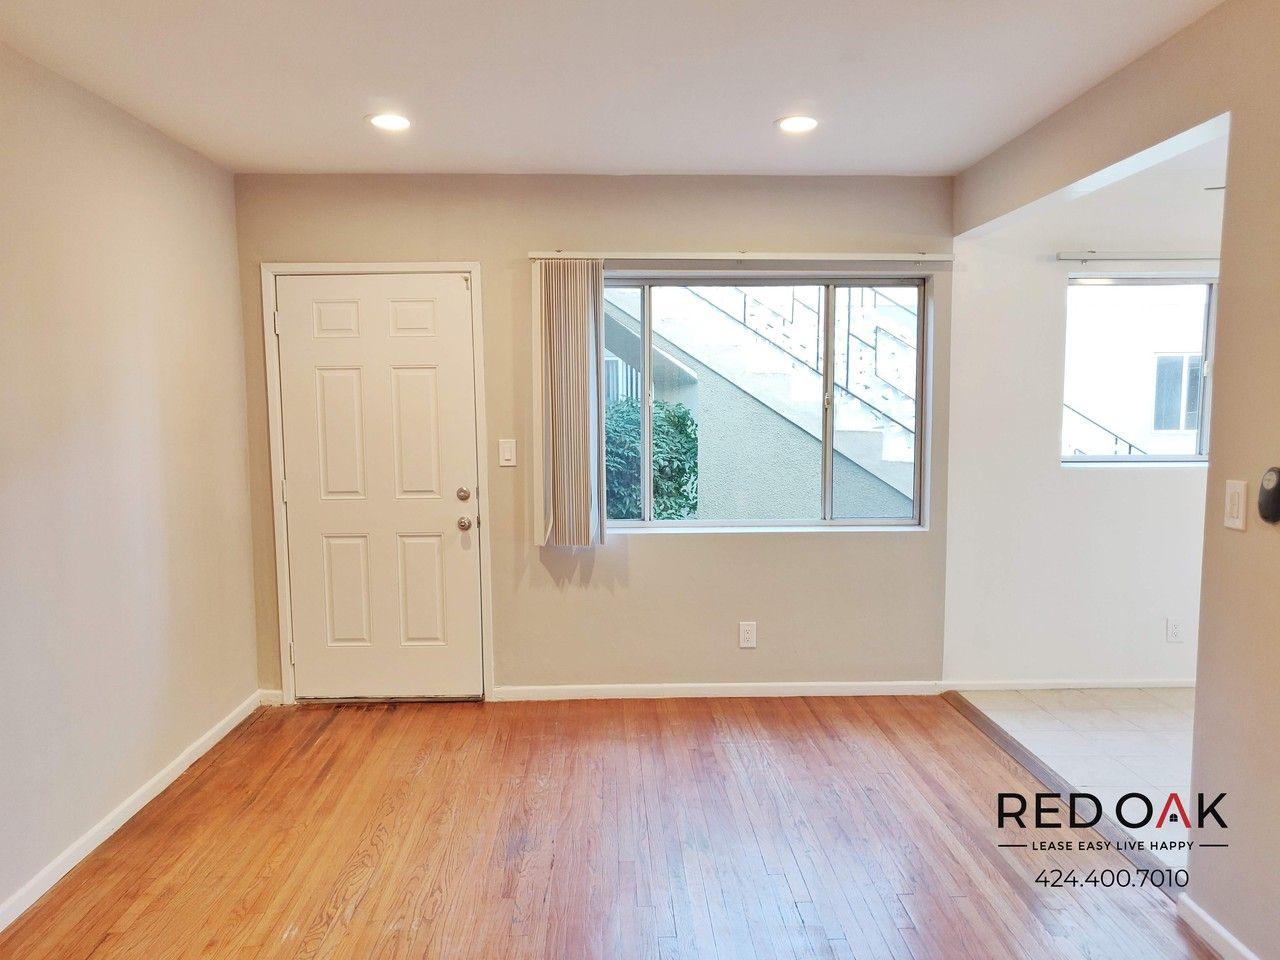 11908 Burbank Blvd 10 Los Angeles Ca 91607 1 Bedroom Apartment For Rent For 1 595 Month Zumper